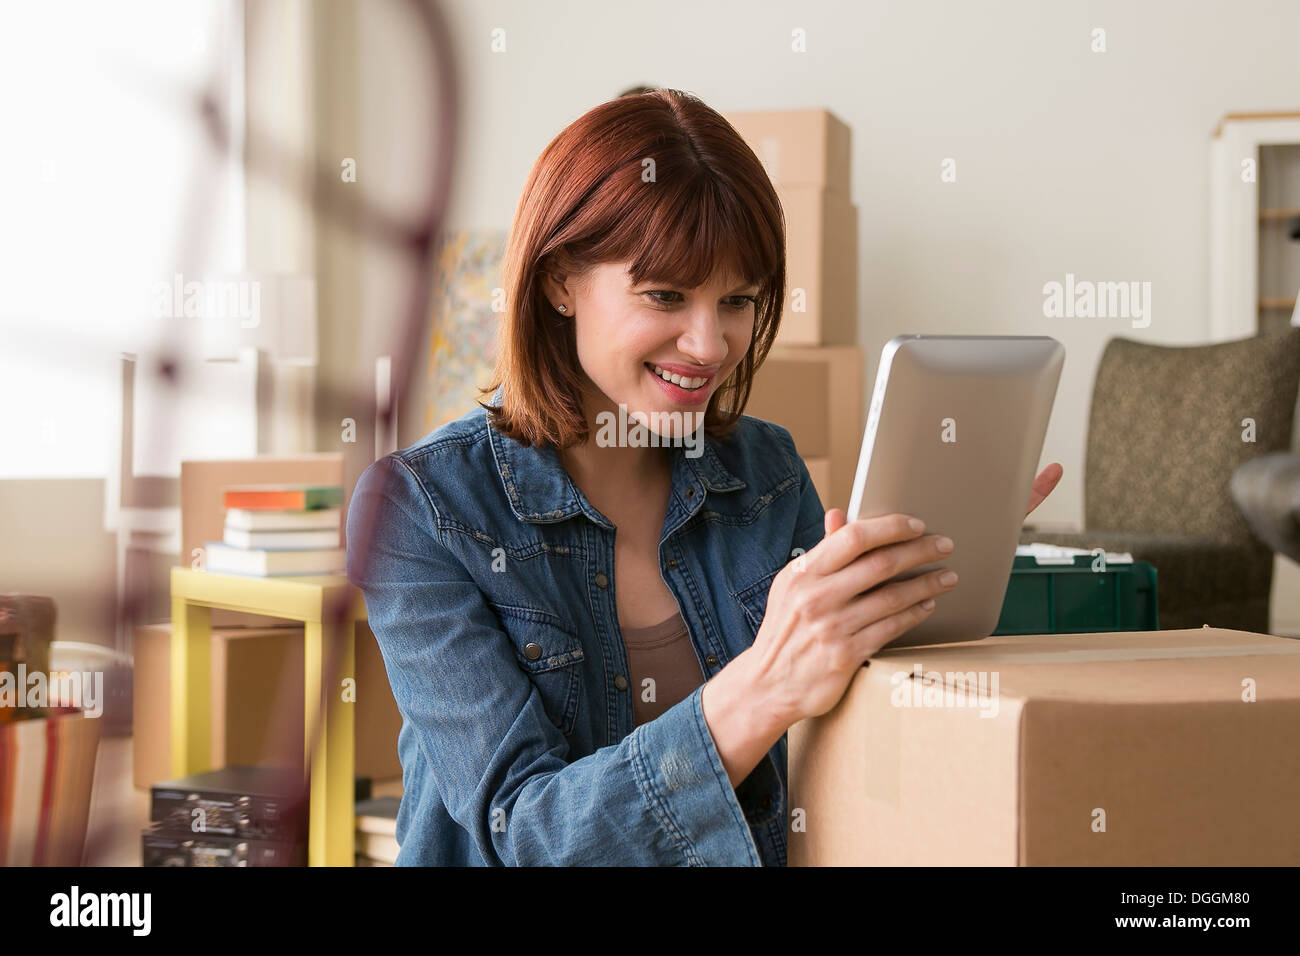 Portrait of woman holding digital tablet amongst cardboard boxes - Stock Image